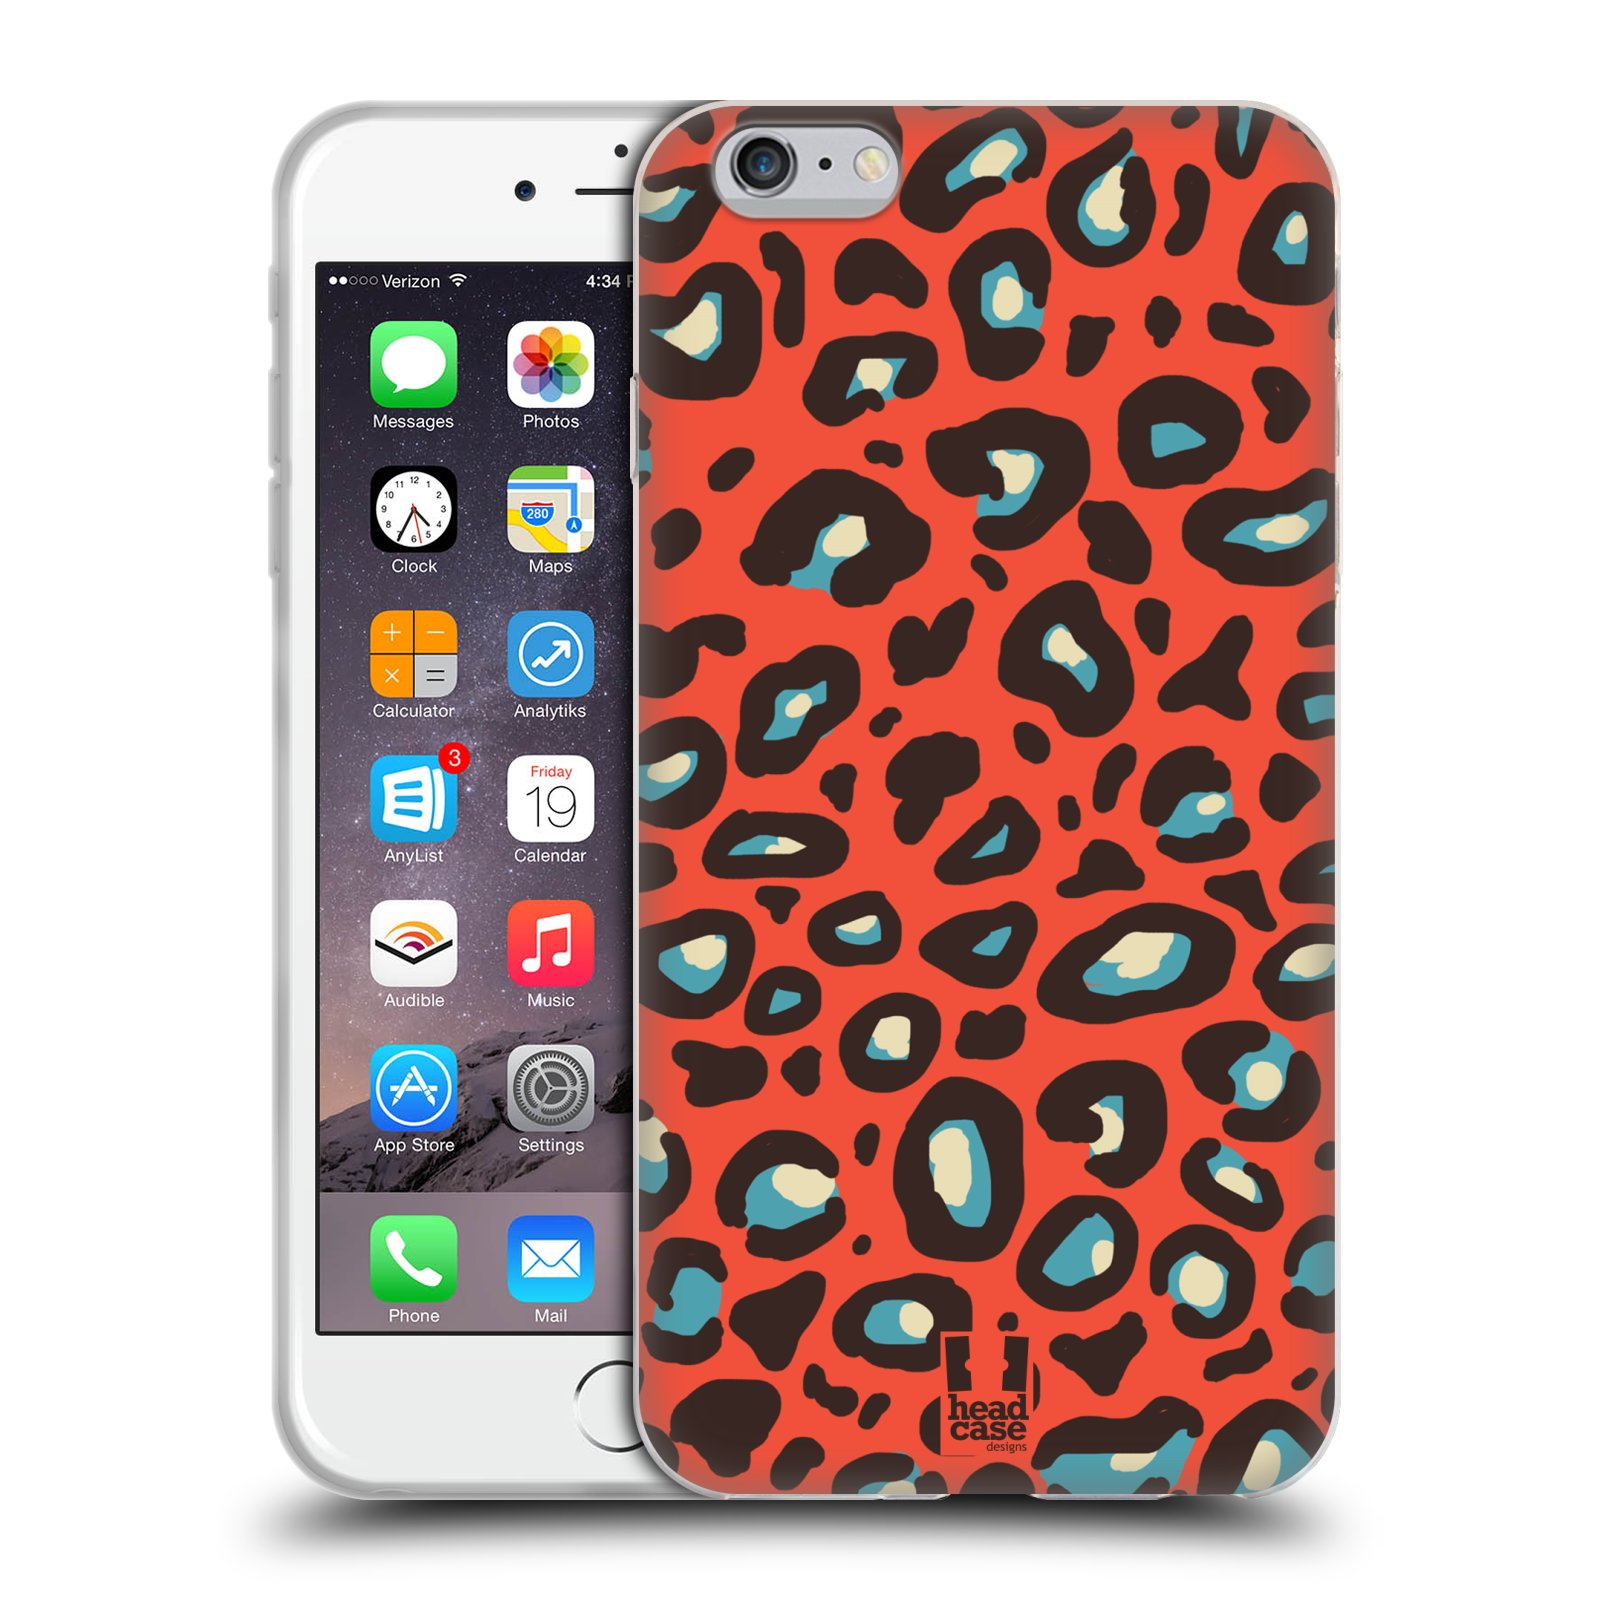 HEAD CASE silikonový obal na mobil Apple Iphone 6 PLUS/ 6S PLUS vzor Divočina zvíře 2 oranžový leopard